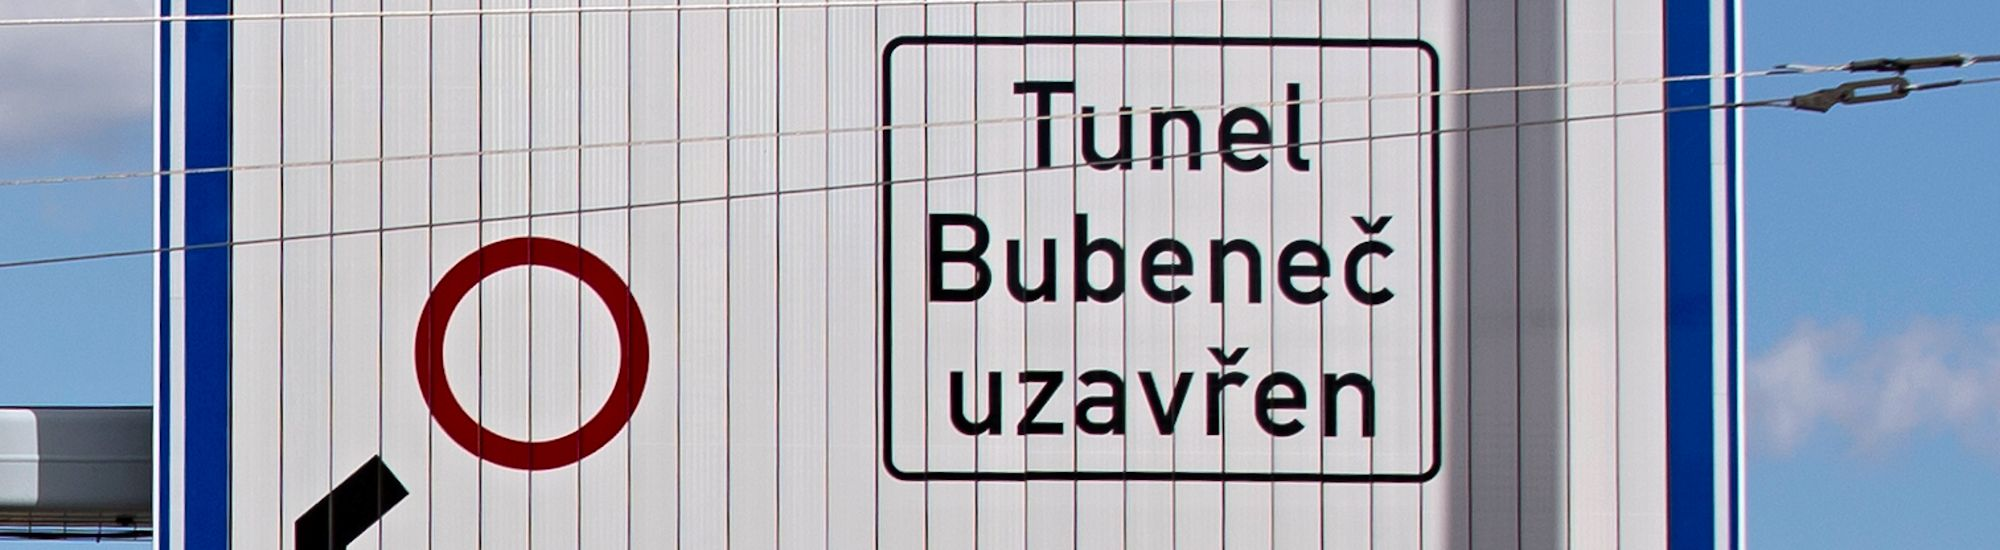 Uzávěra Bubenečského tunelu 20.5.-21.5.2017